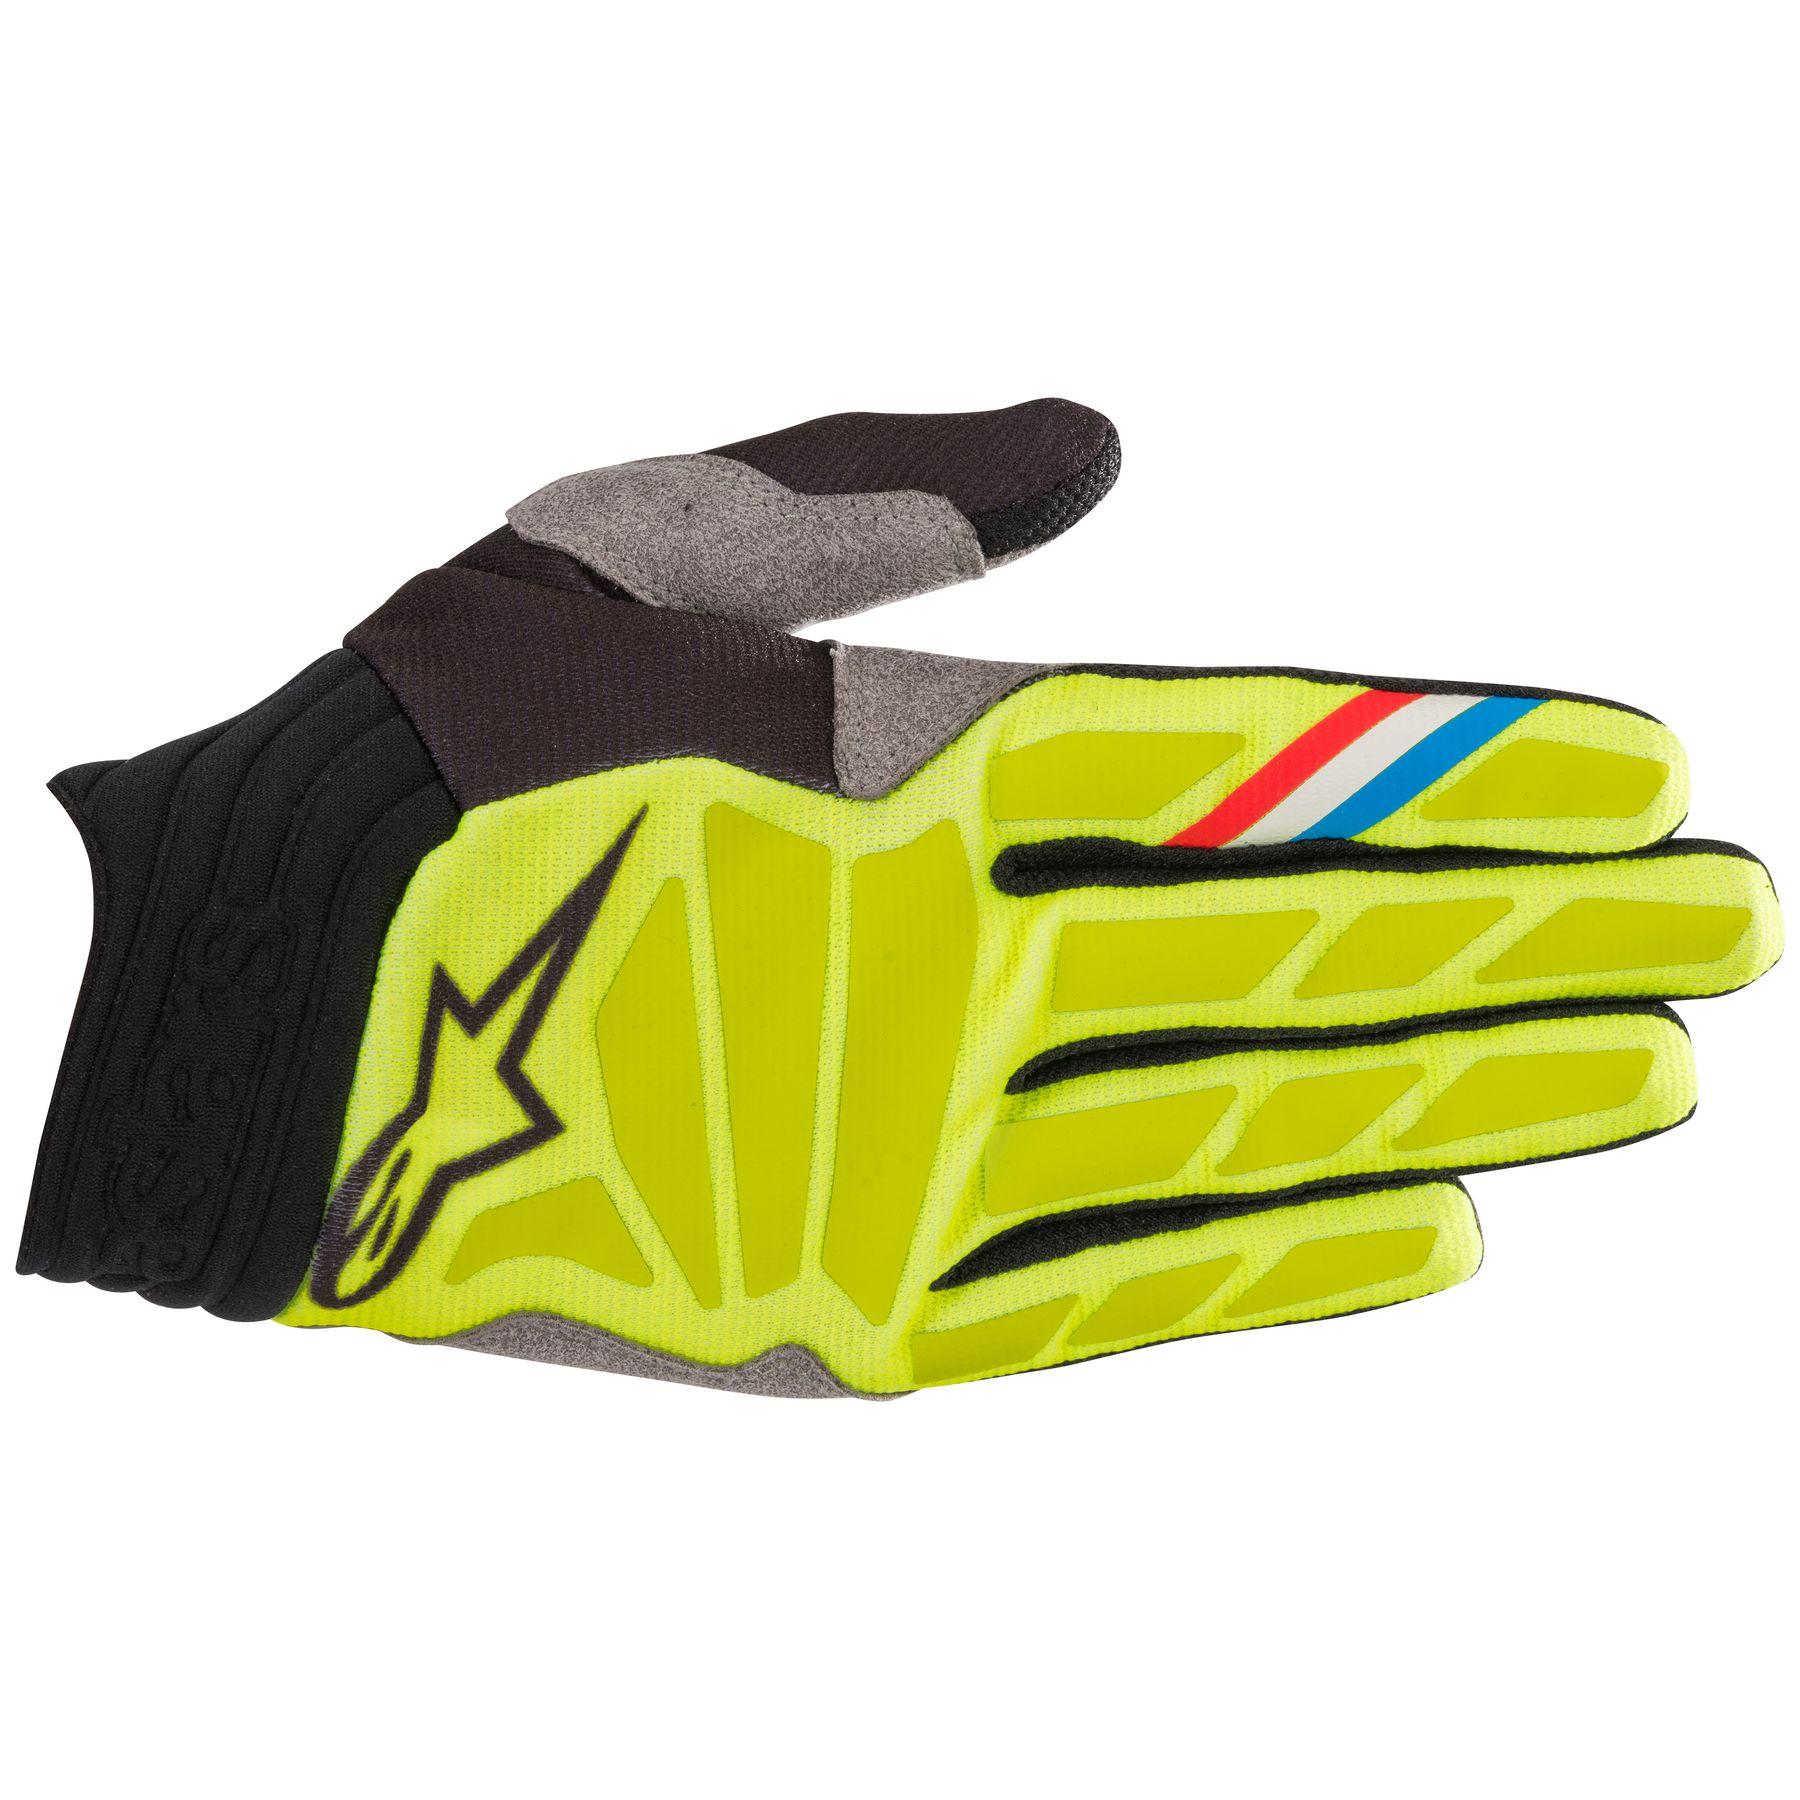 Alpinestars Aviator S9 MX Offroad Gloves Yellow/Black